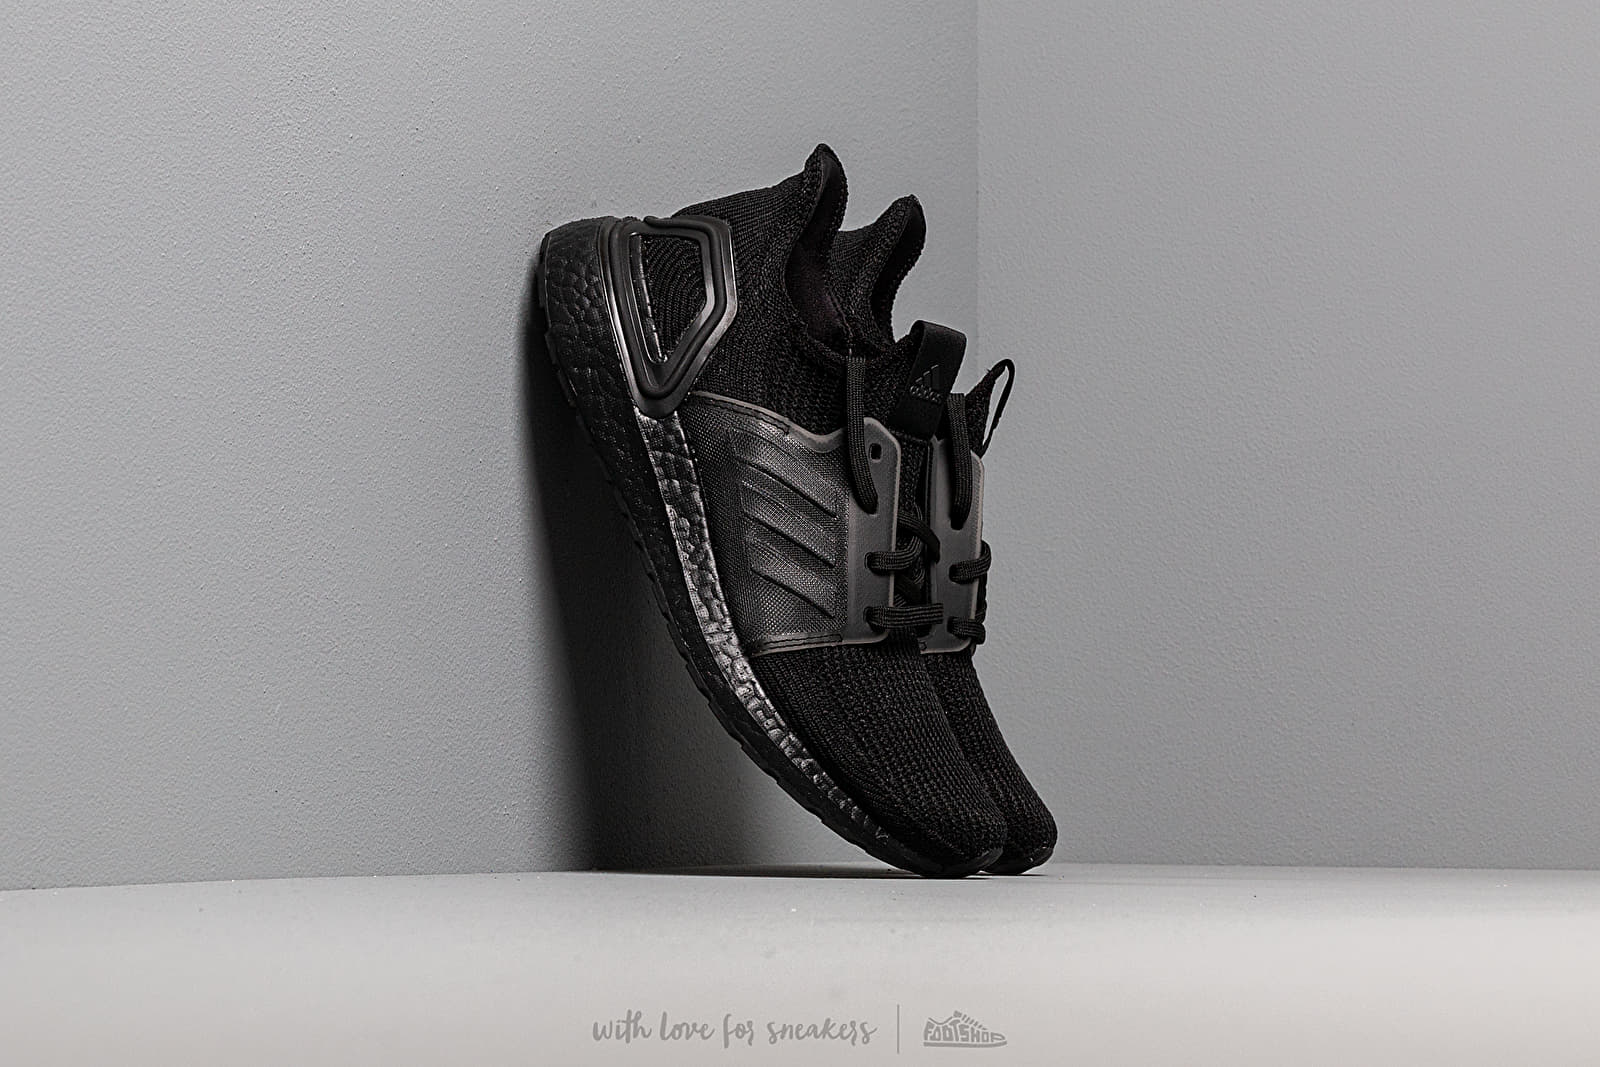 Dámské tenisky a boty adidas UltraBOOST 19 w Core Black/ Core Black/ Solar Orange